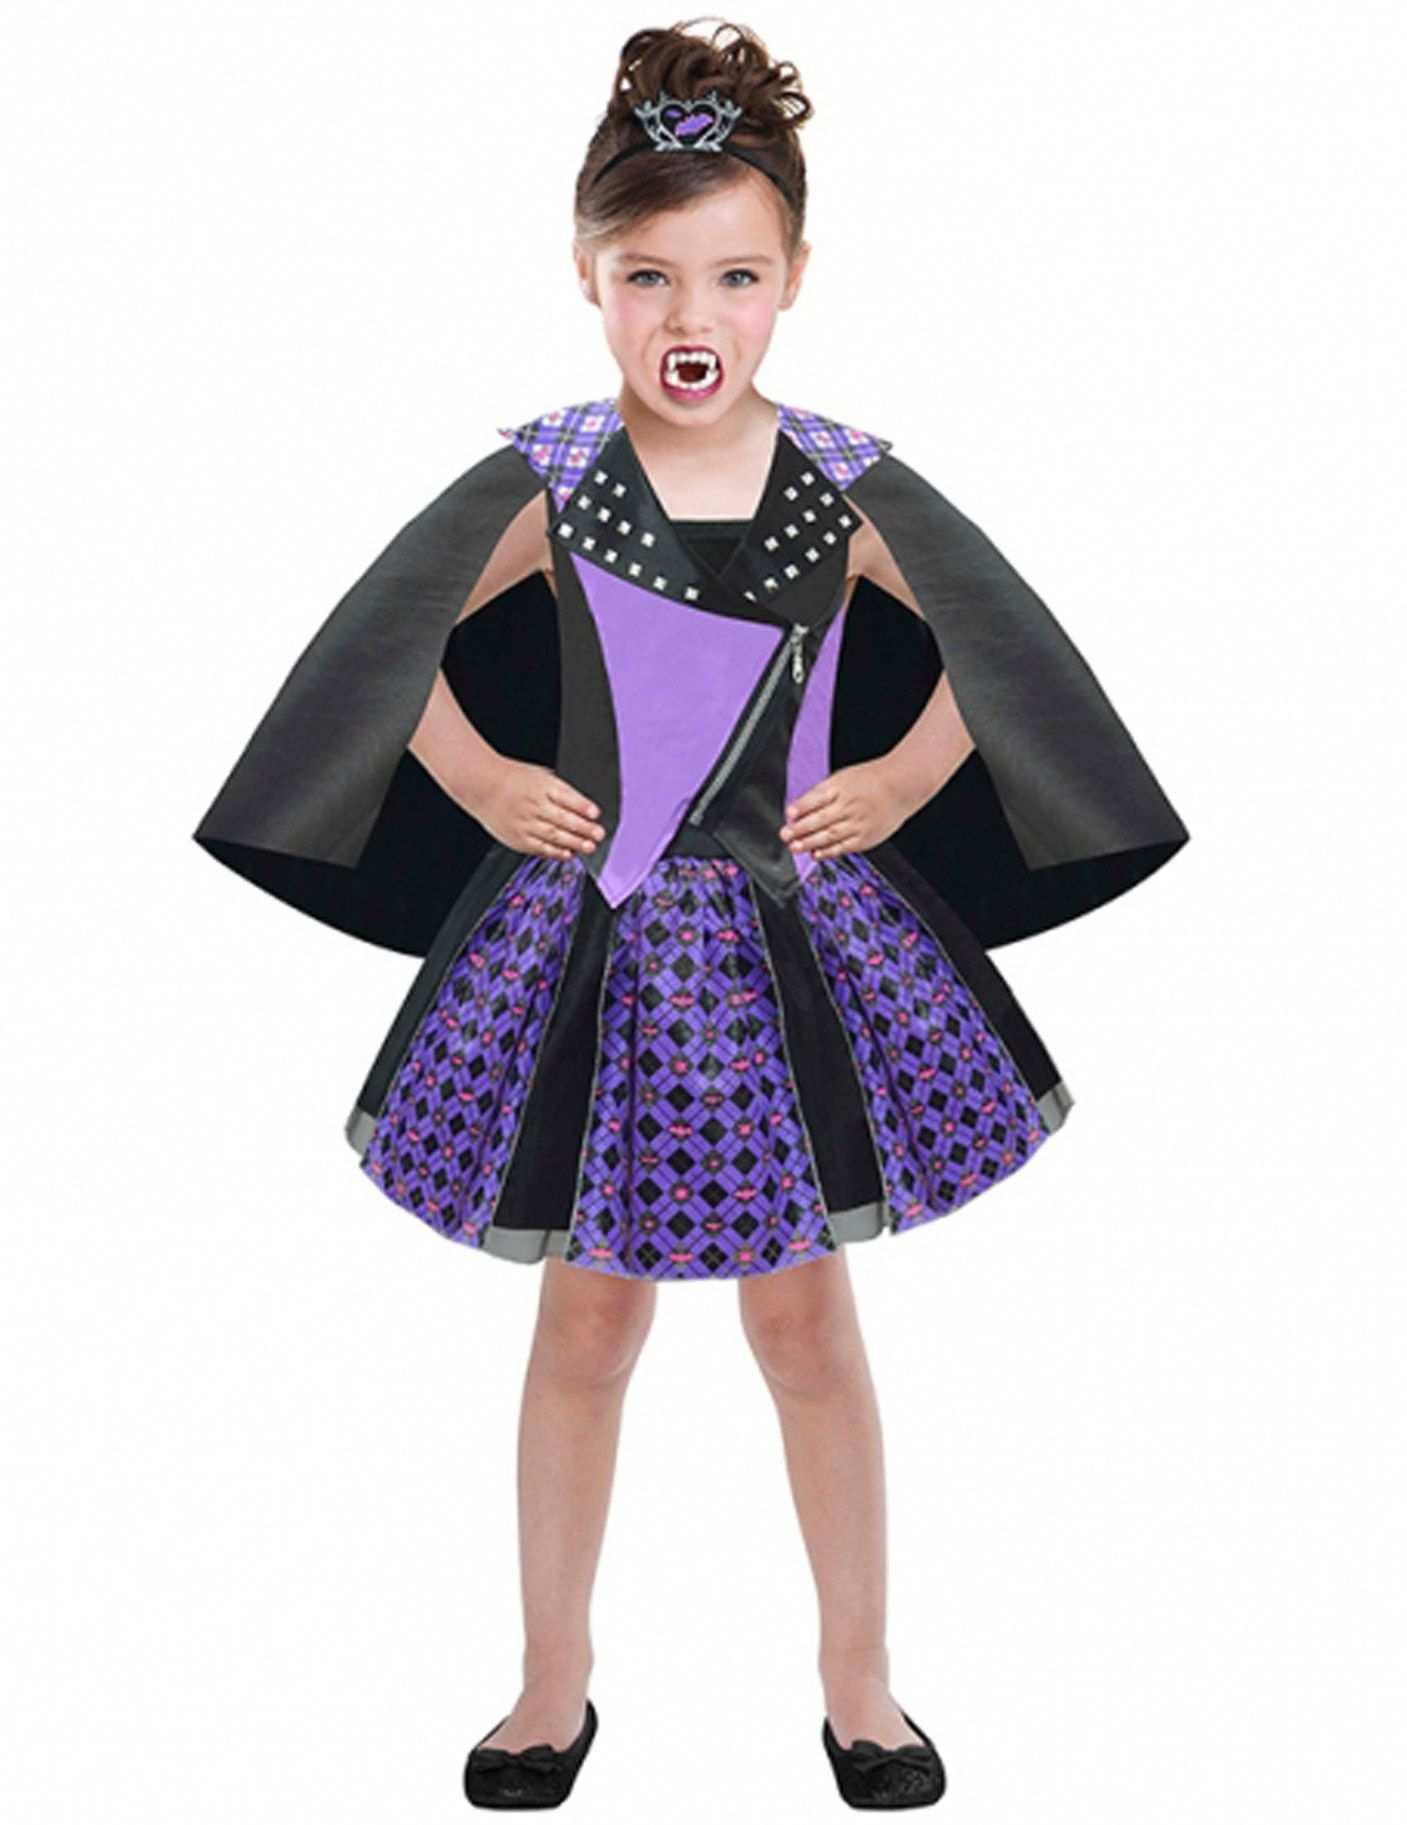 Chica Vampiro Daisy Kostuum Voor Meisjes Kinderkostuums En Goedkope Carnavalskleding Vegaoo Roupa De Vampiro Roupas Infantil Fantasias